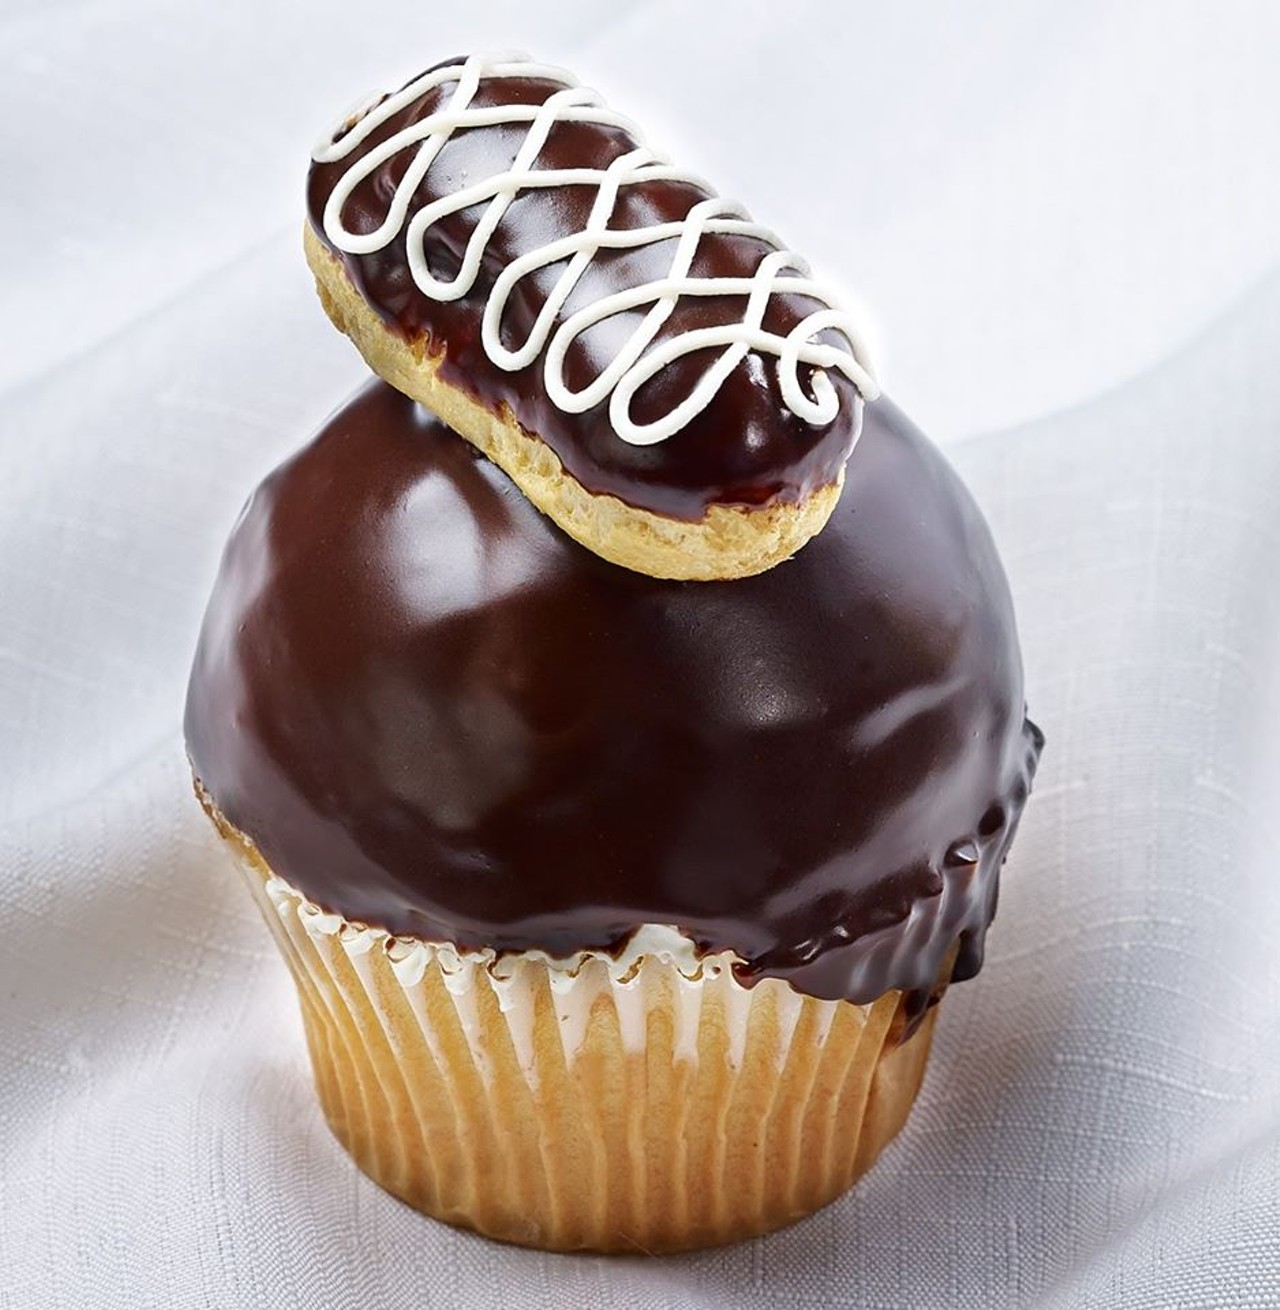 Jilly S Cupcake Bar Ladue American Bakery Dessert